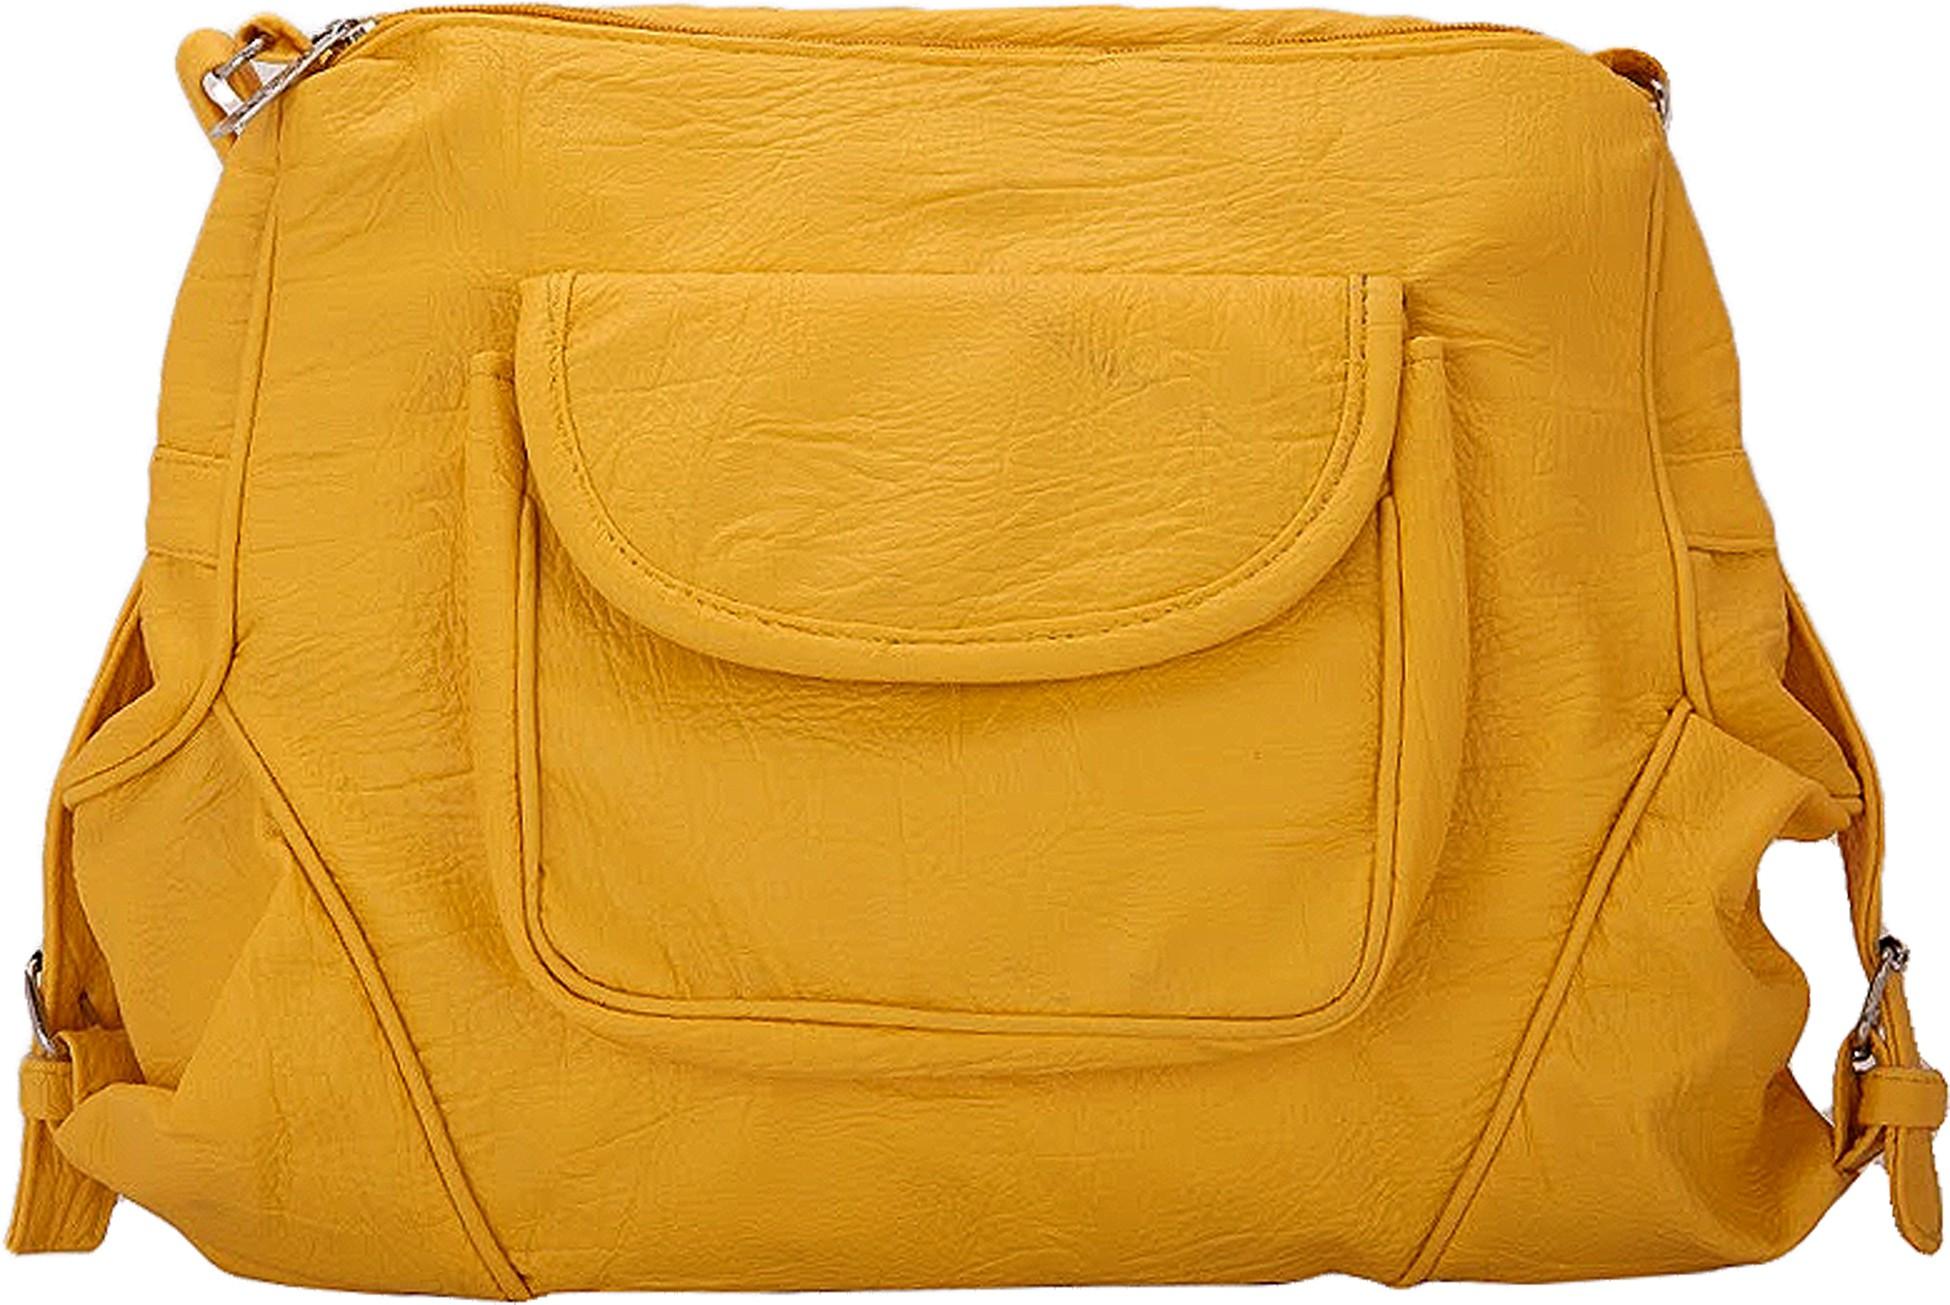 Sling bag below 500 - Borse Women Yellow Pu Sling Bag